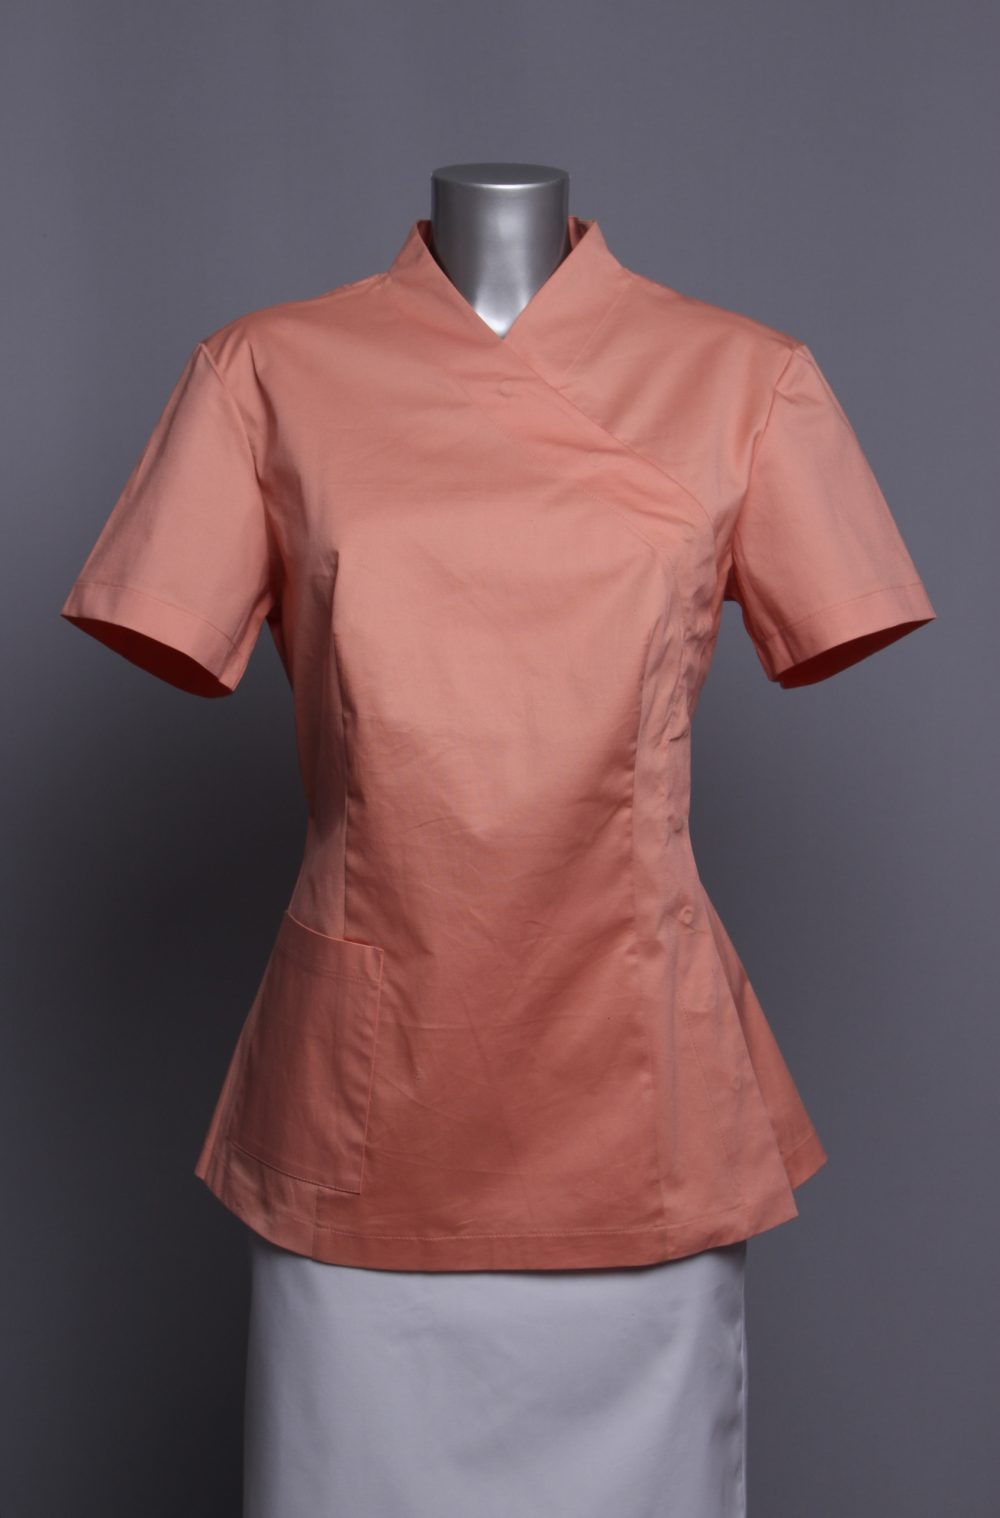 medical, wellness, hairdressers uniforms